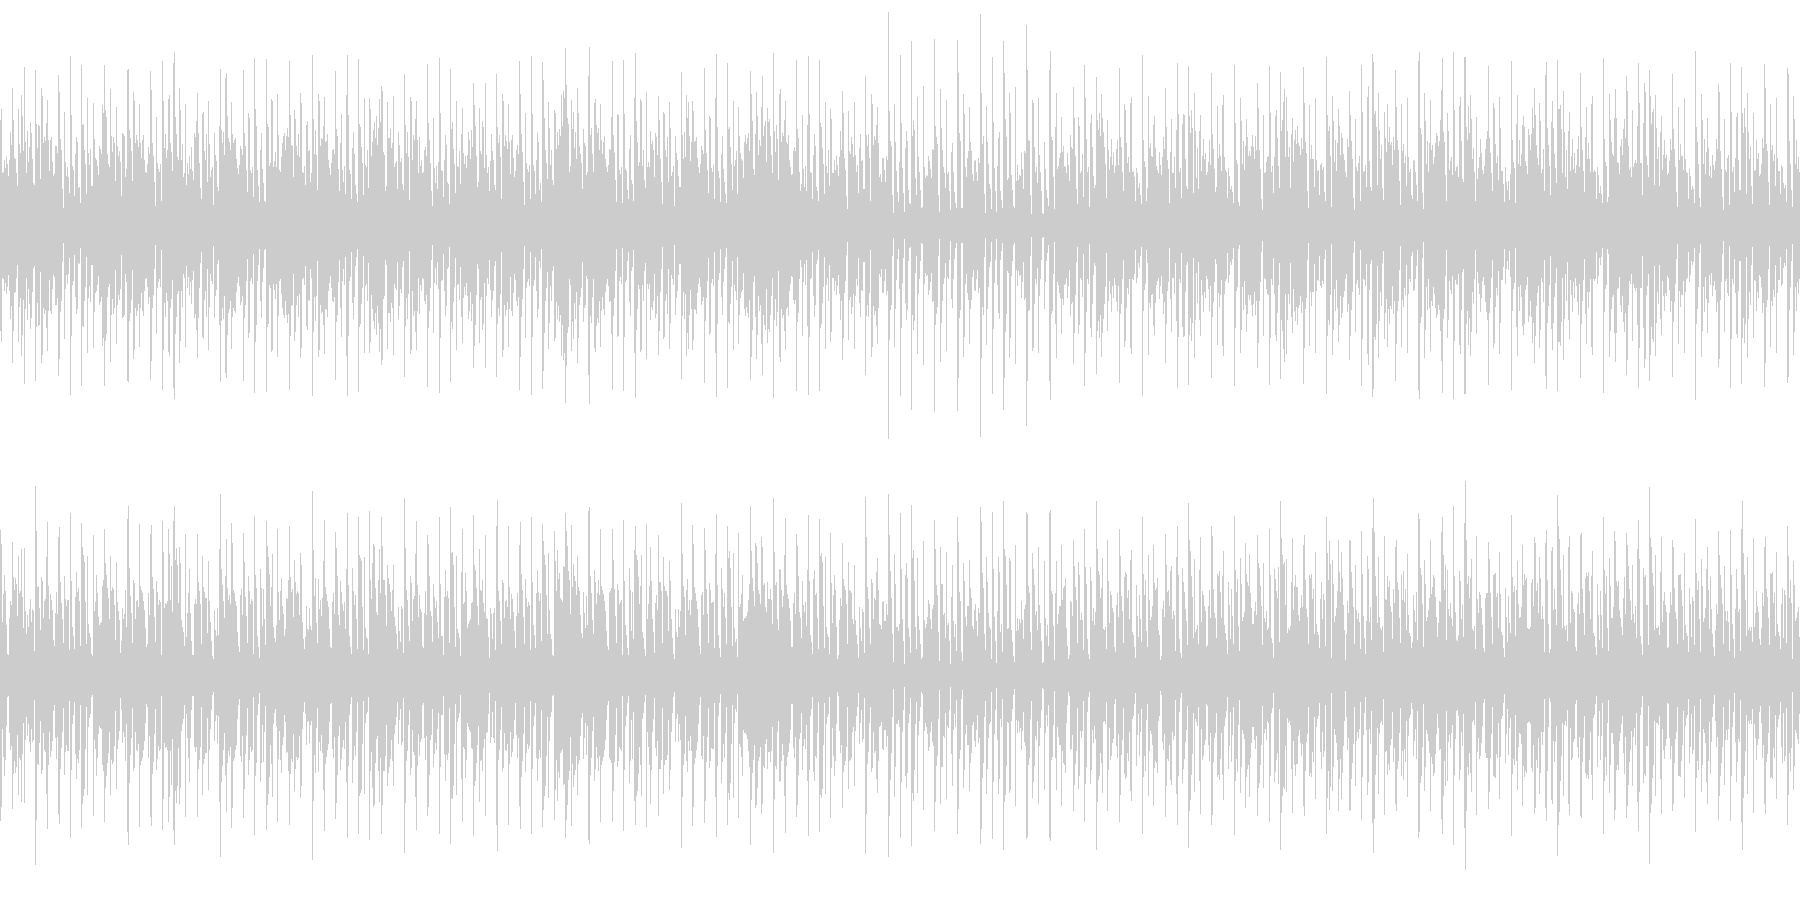 DJライブBGMの未再生の波形